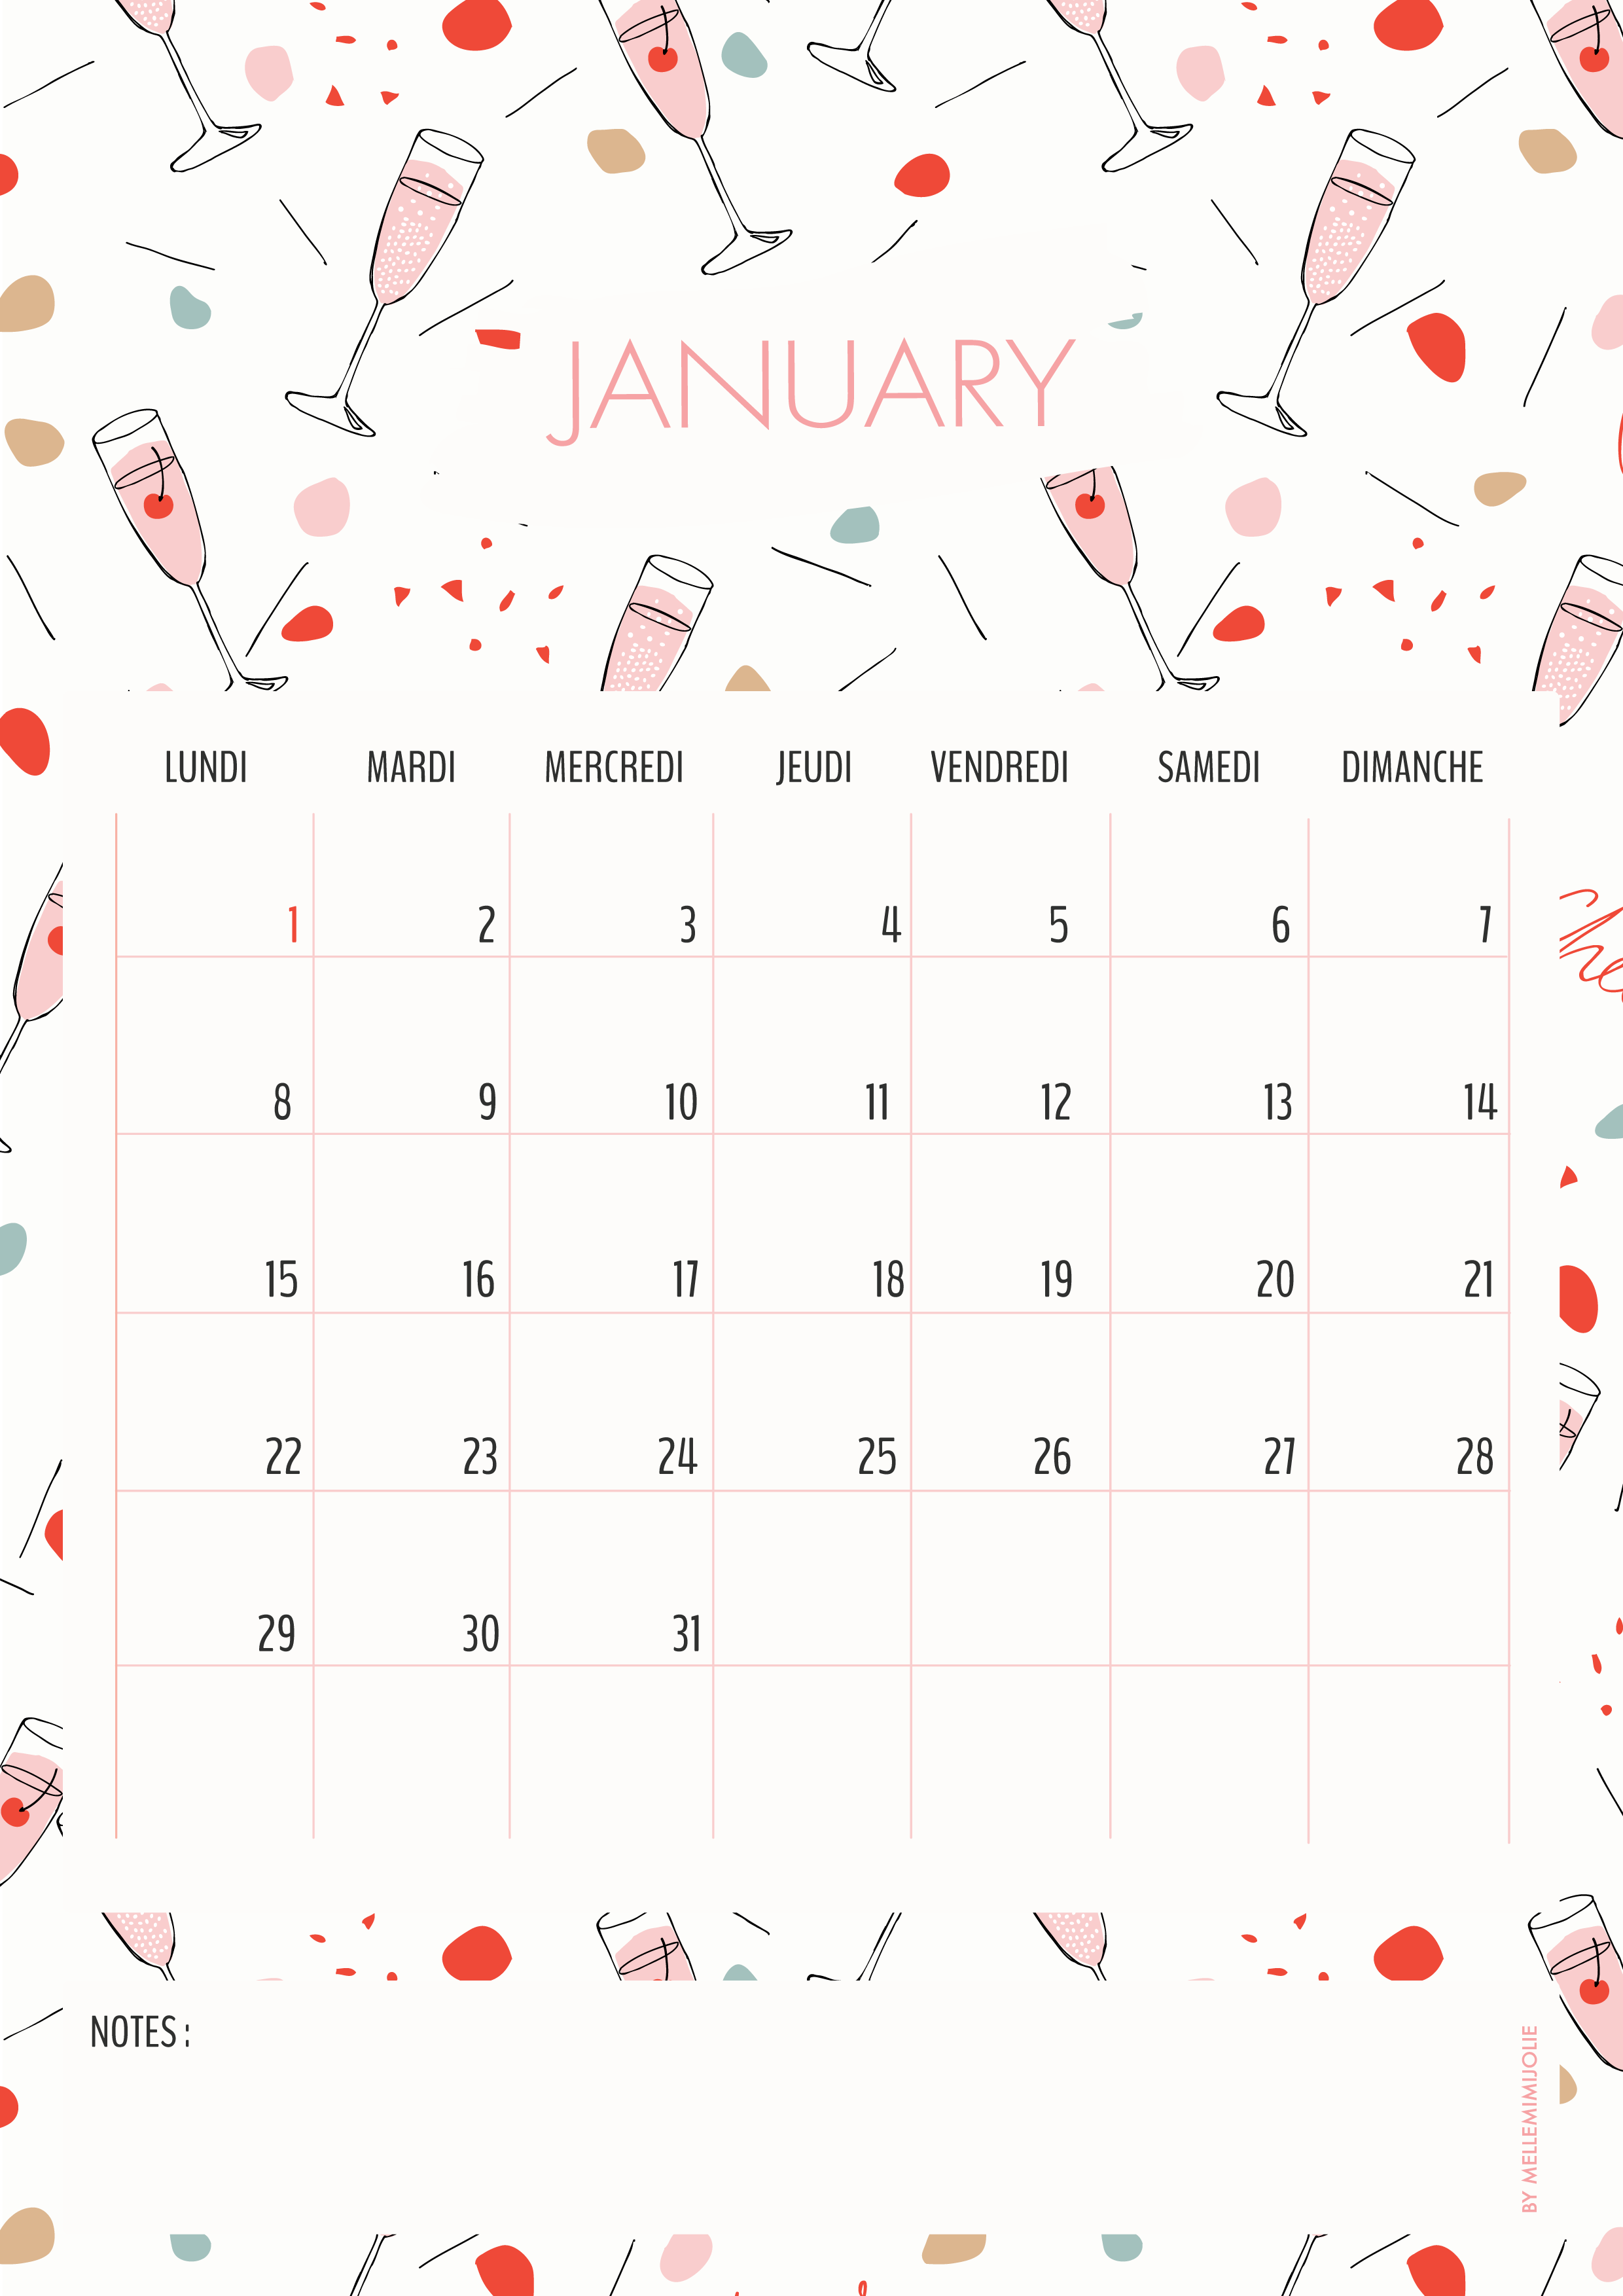 Cheers -Calendrier Janvier 2018 | MelleMimijolie